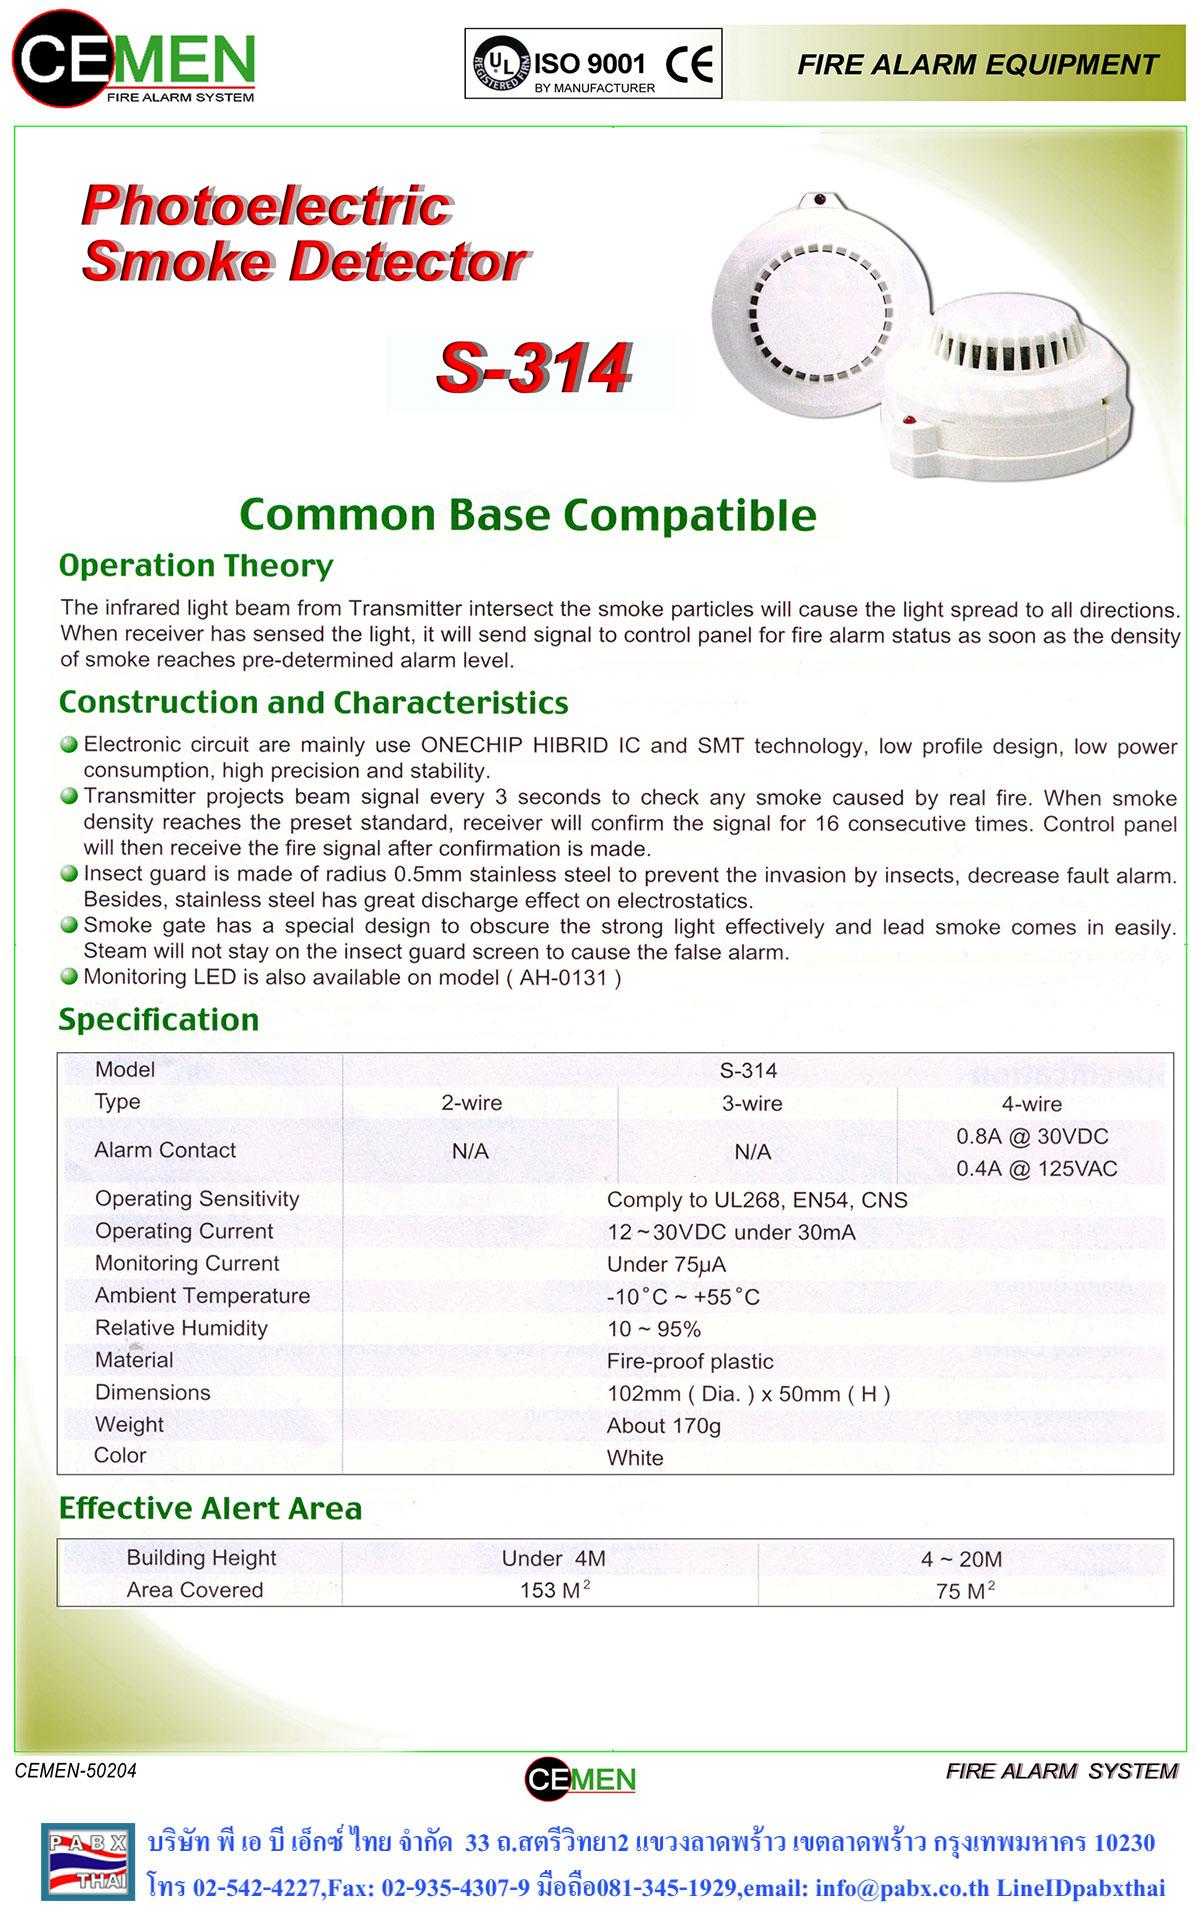 Smoke Detector CEMEN S-314 อุปกรณ์ตรวจจับควันไฟ สินค้าพร้อมส่ง/ราคาขายส่ง